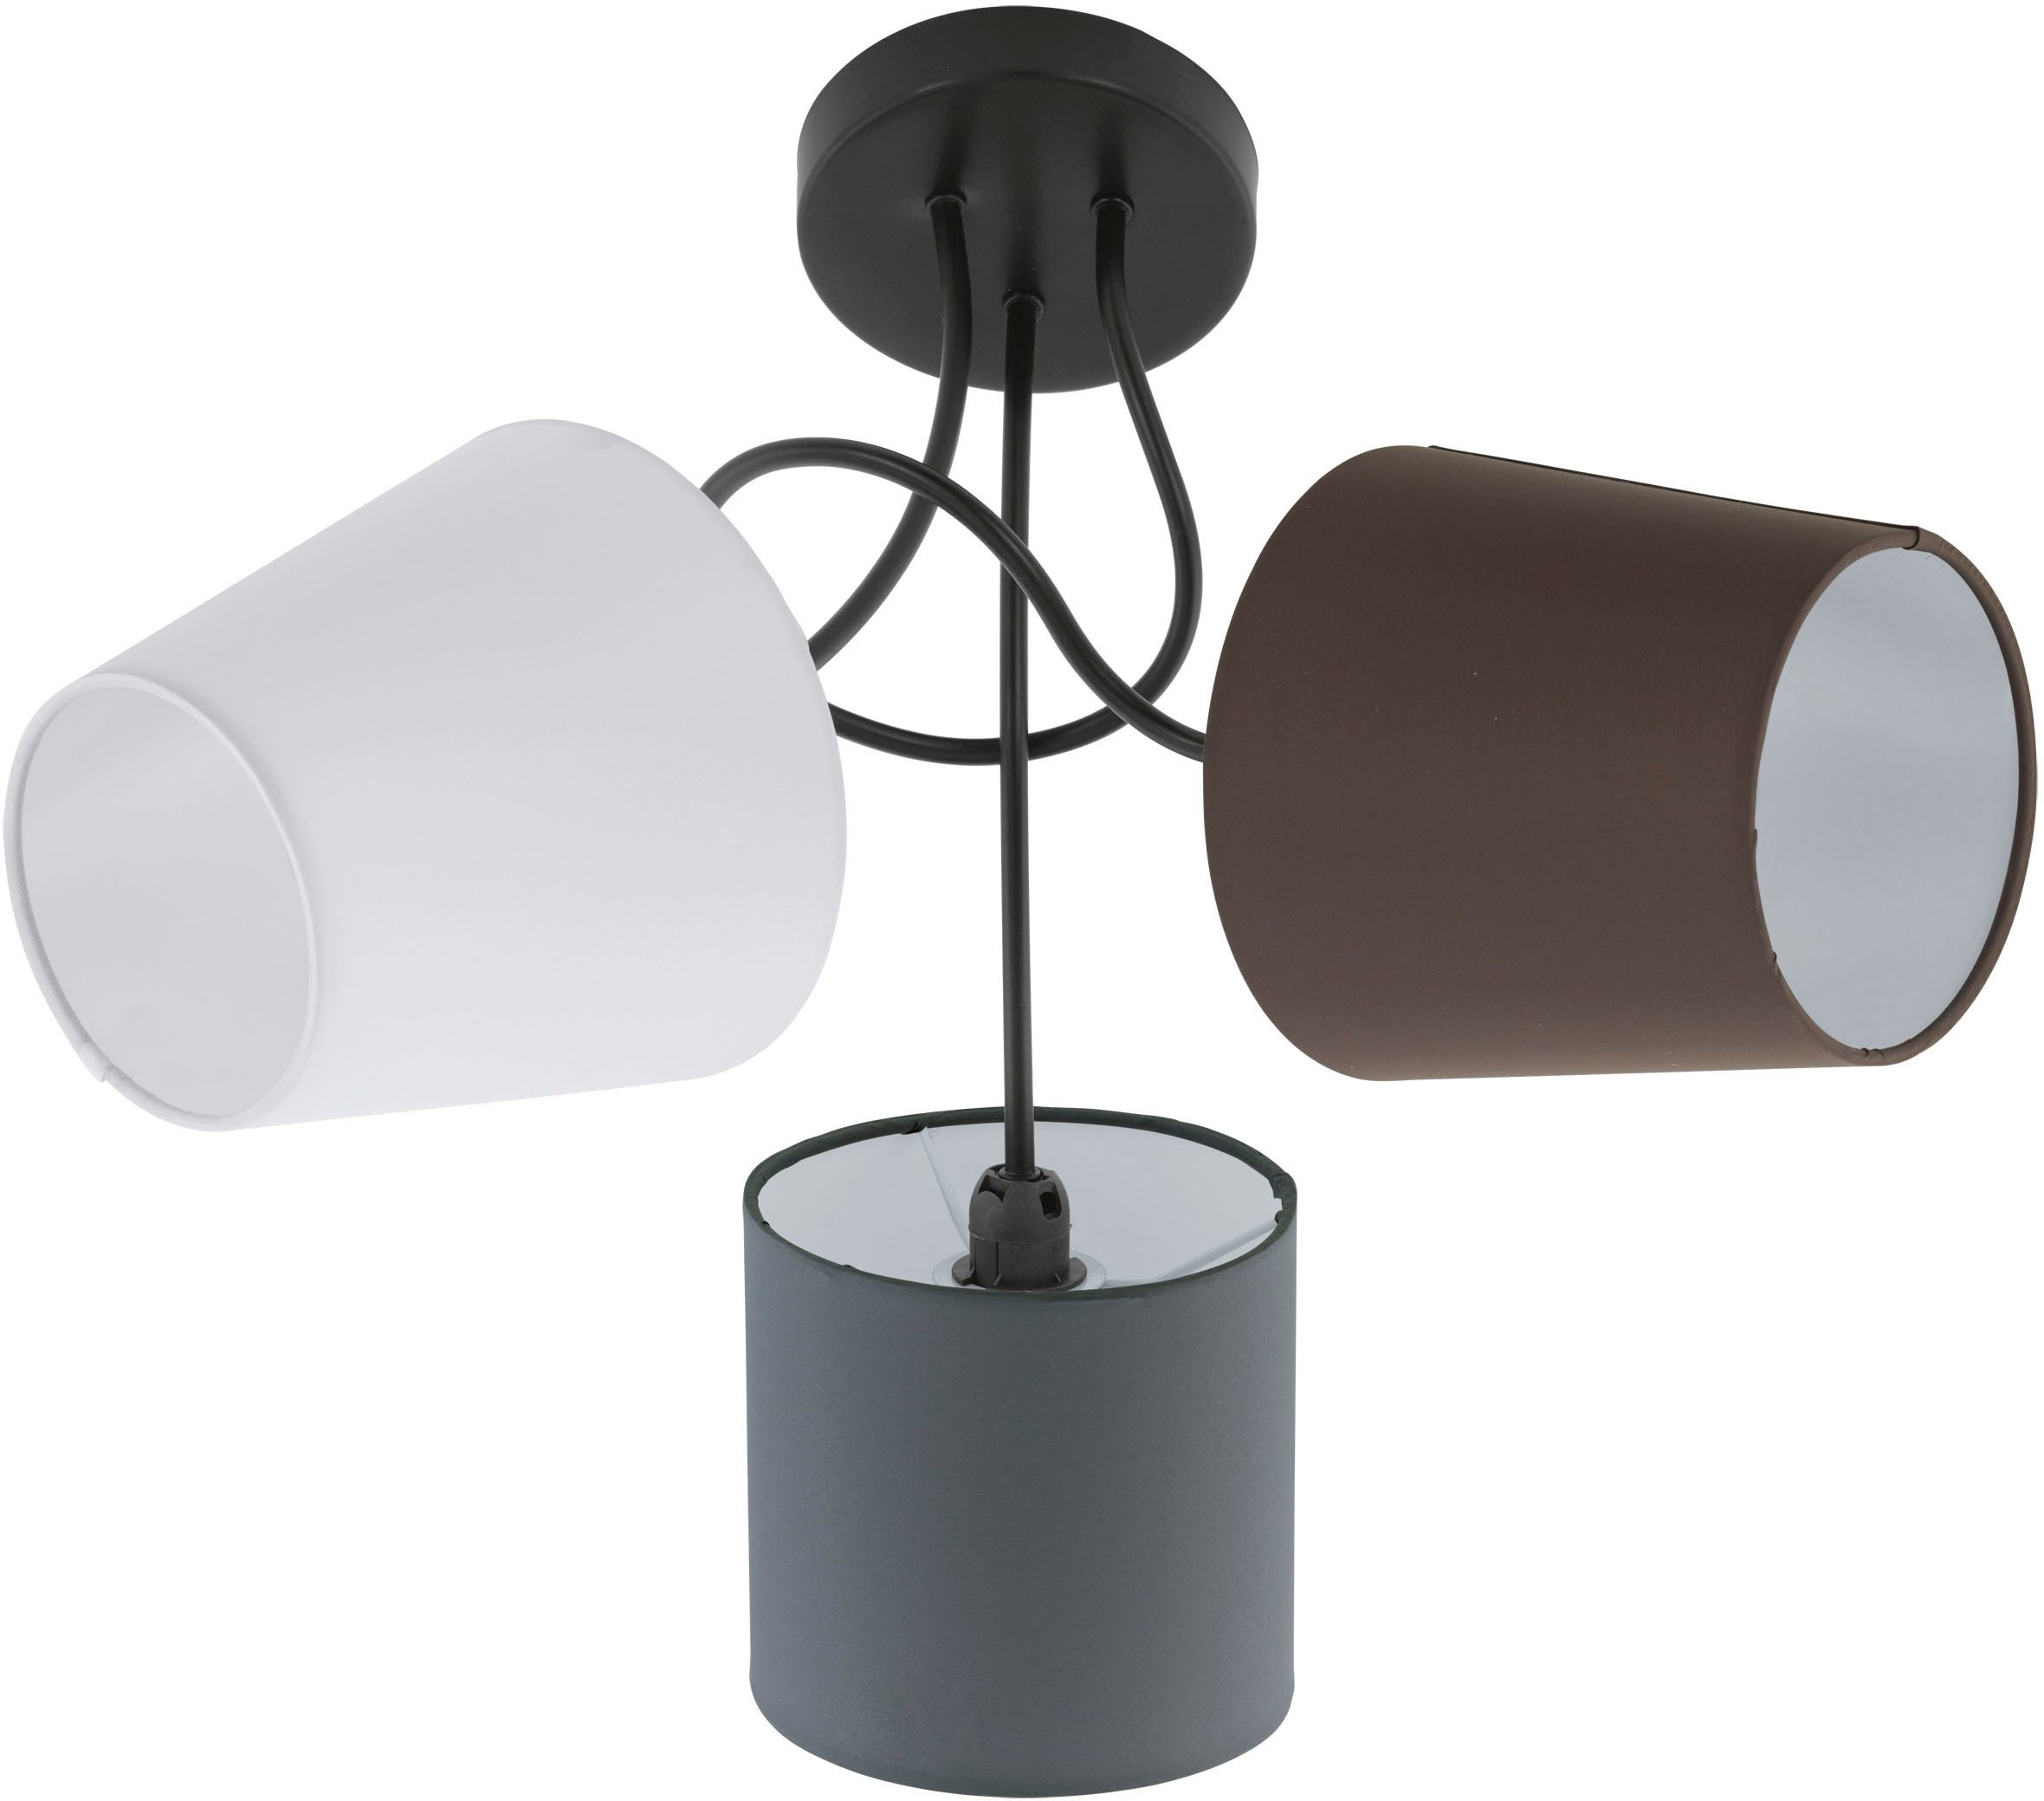 EGLO plafondlamp ALMEIDA Plafondlamp in de webshop van OTTO kopen